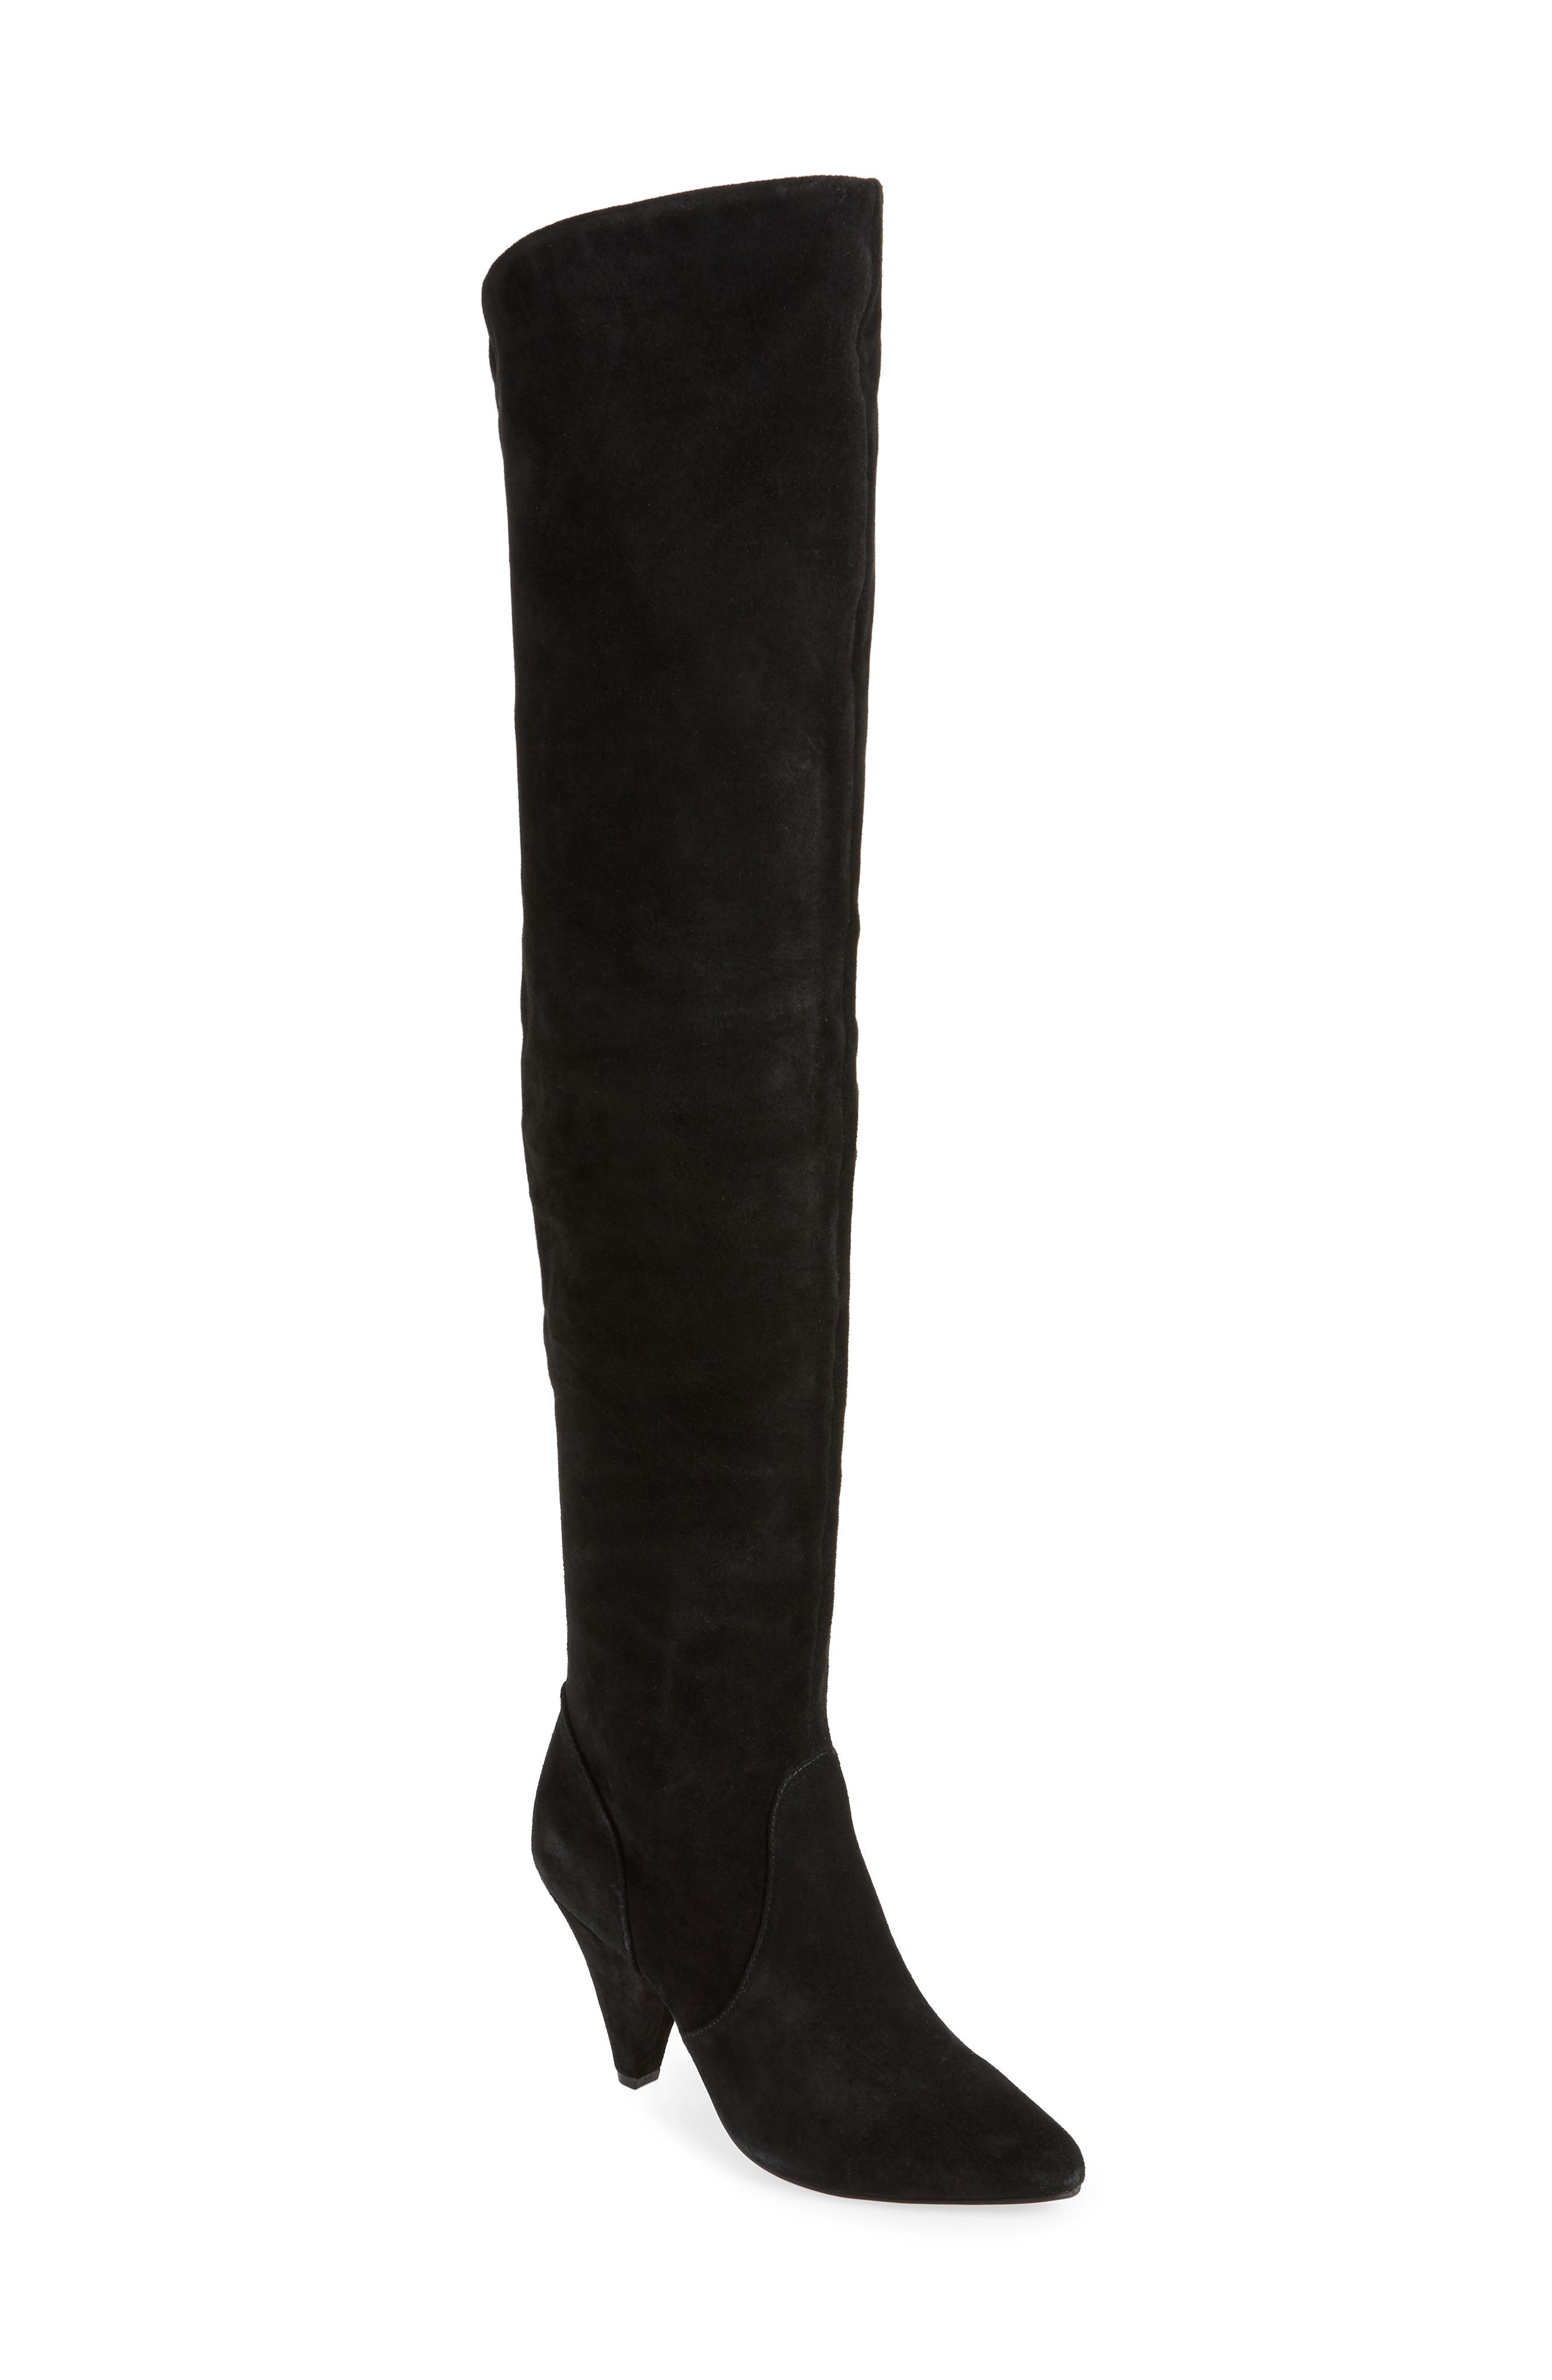 KURT GEIGER Women'S Violet Over-The-Knee Boots in Black Suede